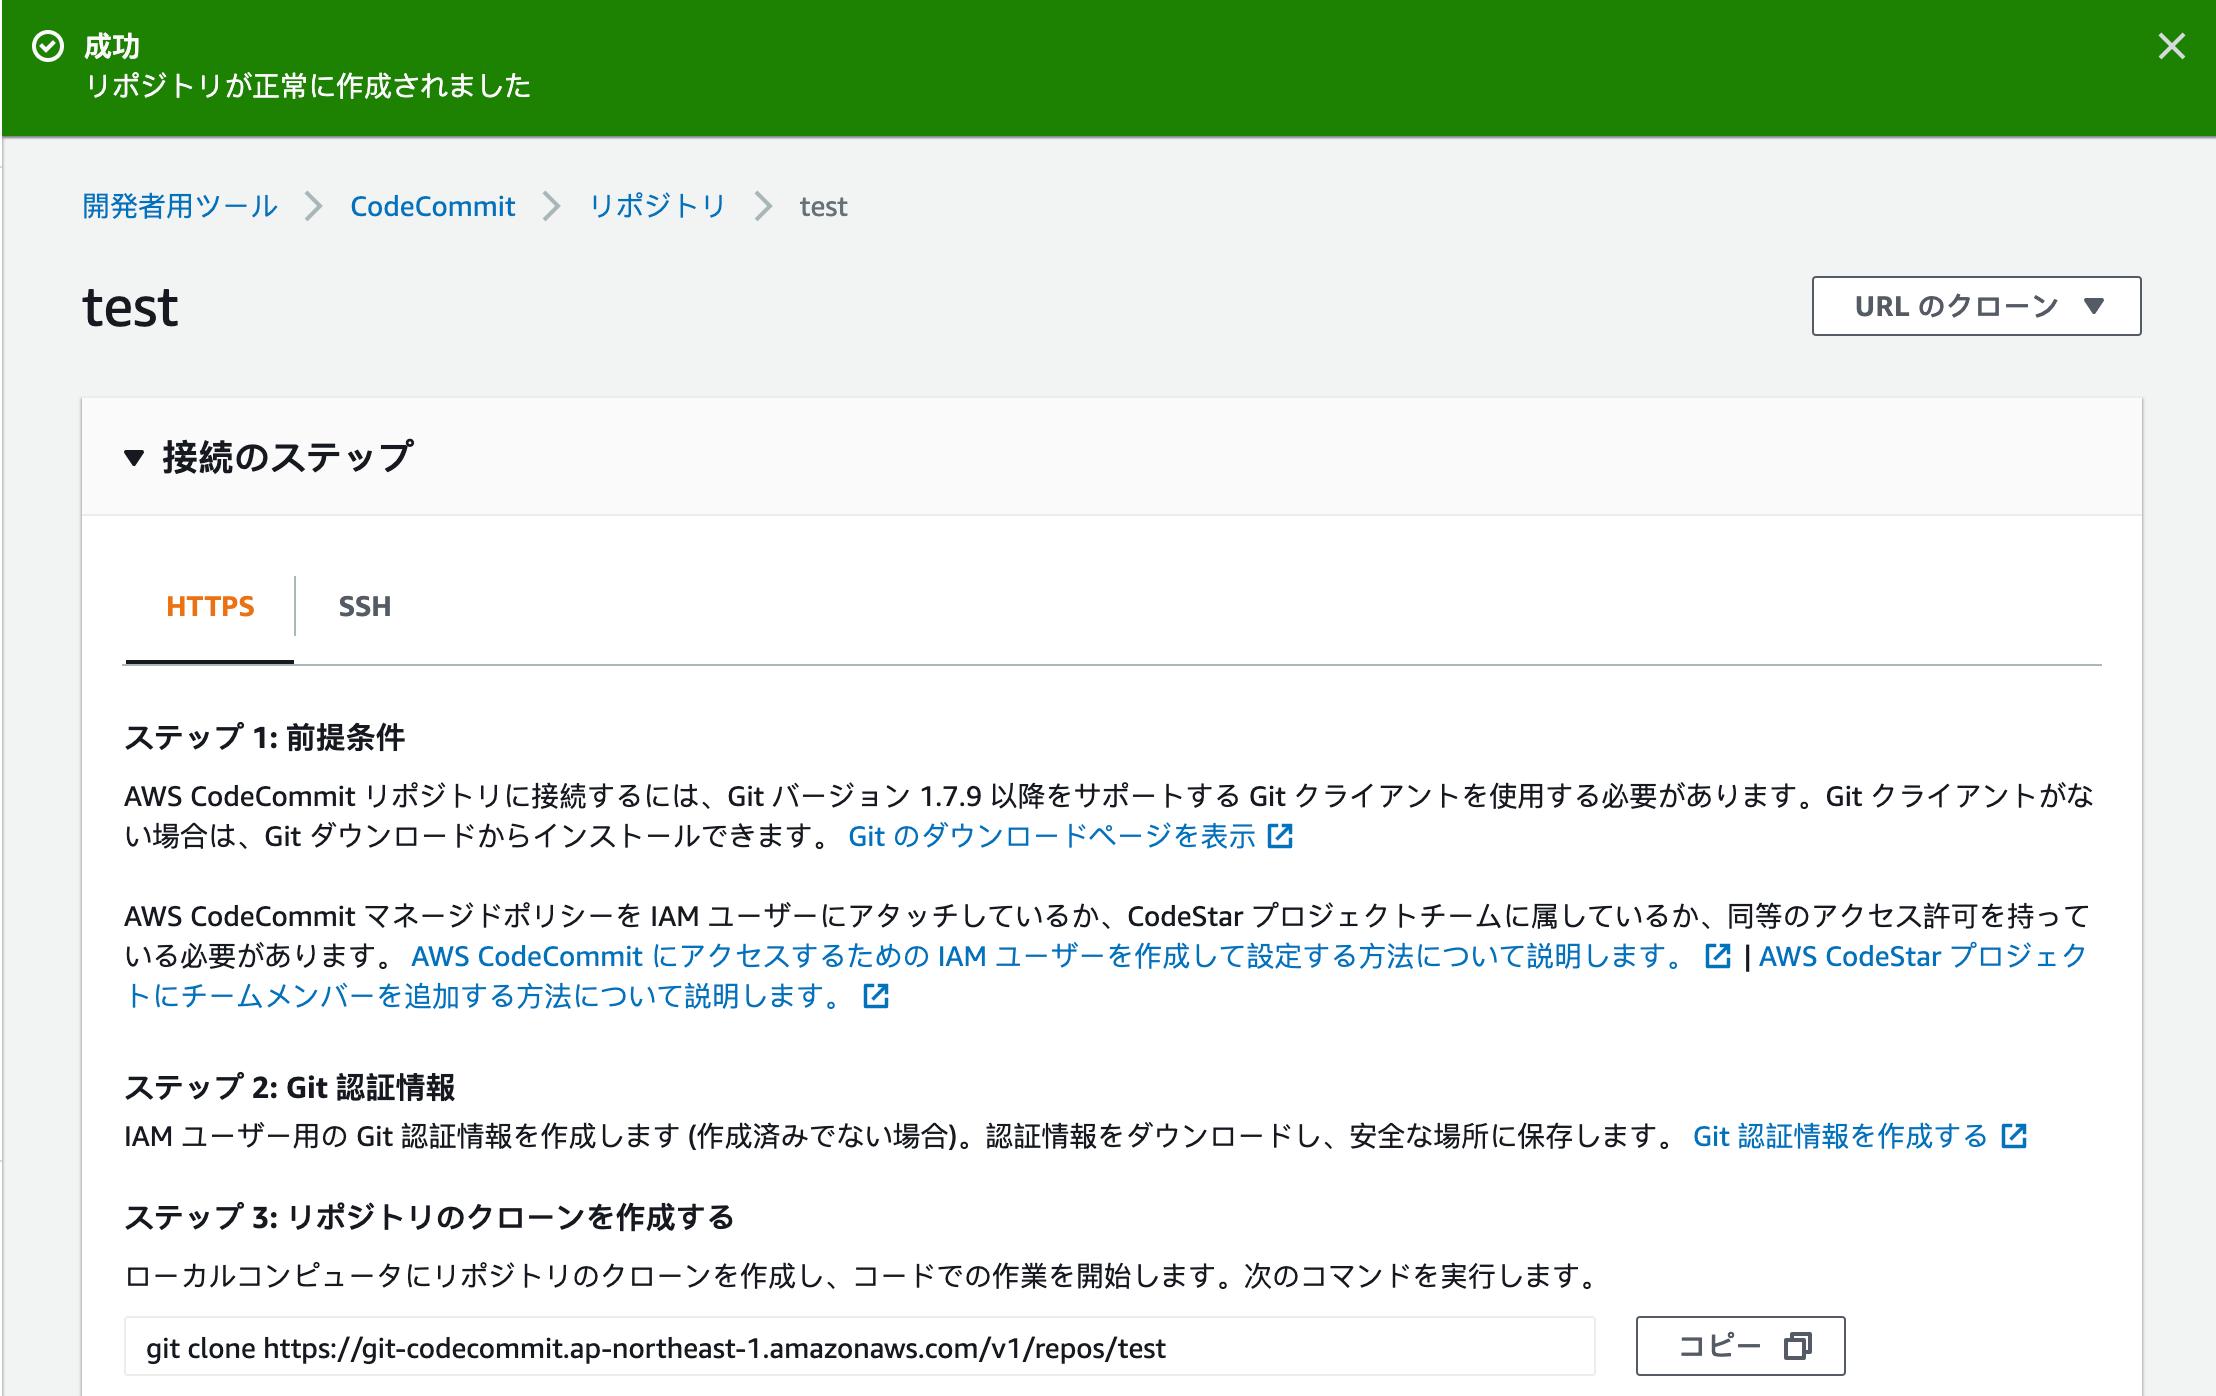 Screenshot 0032-01-14 at 10.14.19 PM.png